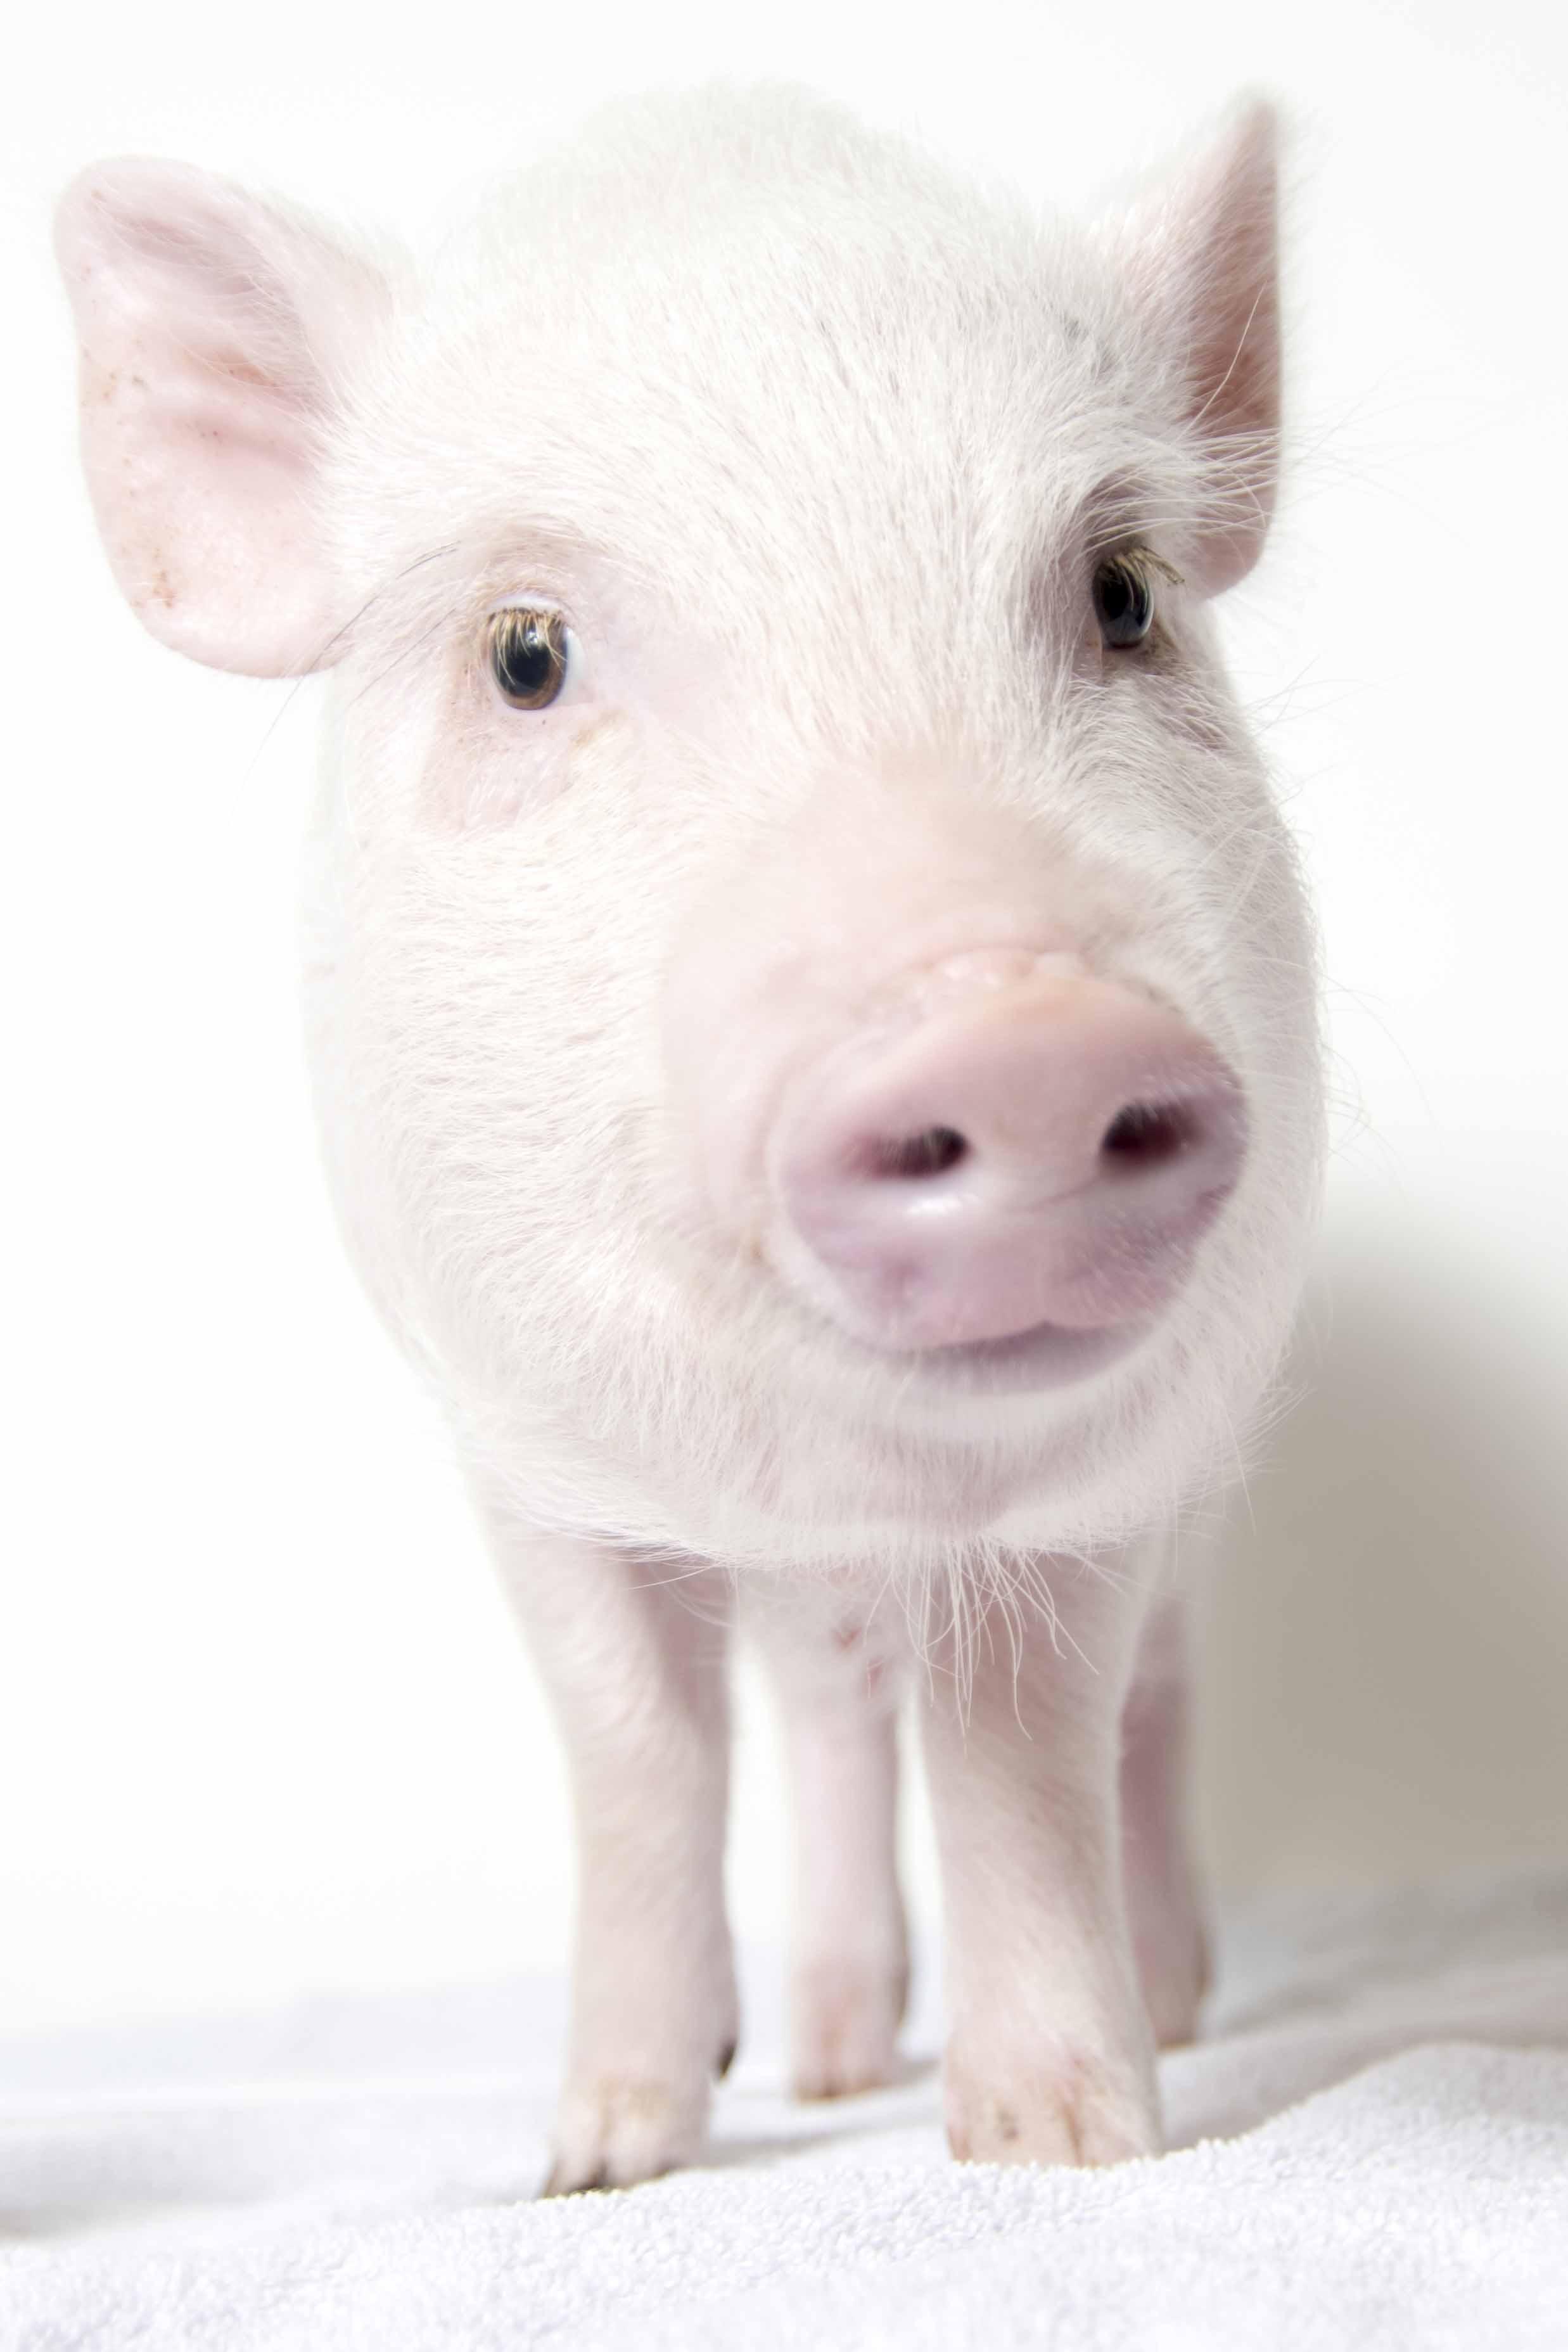 Rosie_Pig_AWLA_8_7_2017_07.jpg